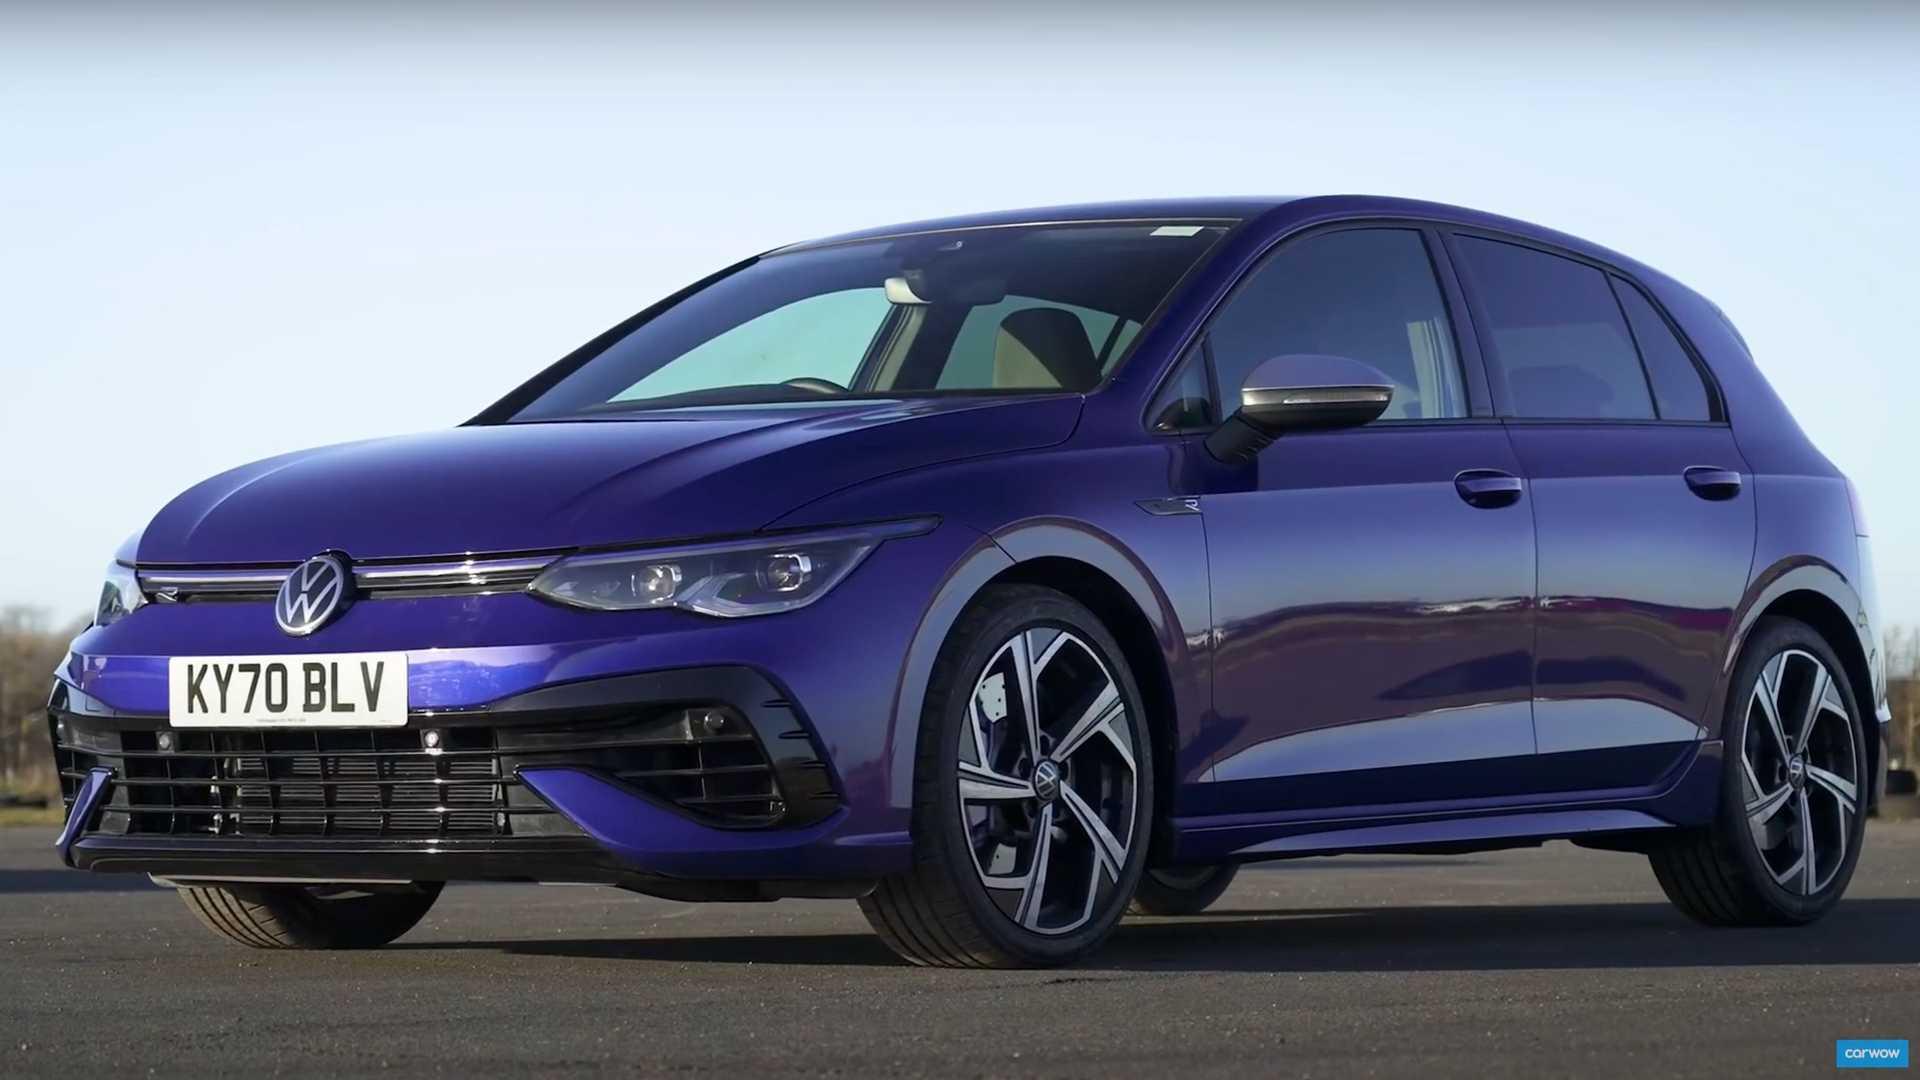 2021 VW Golf R Drag Races Its Luxury Hot Hatch Rivals - Motor1